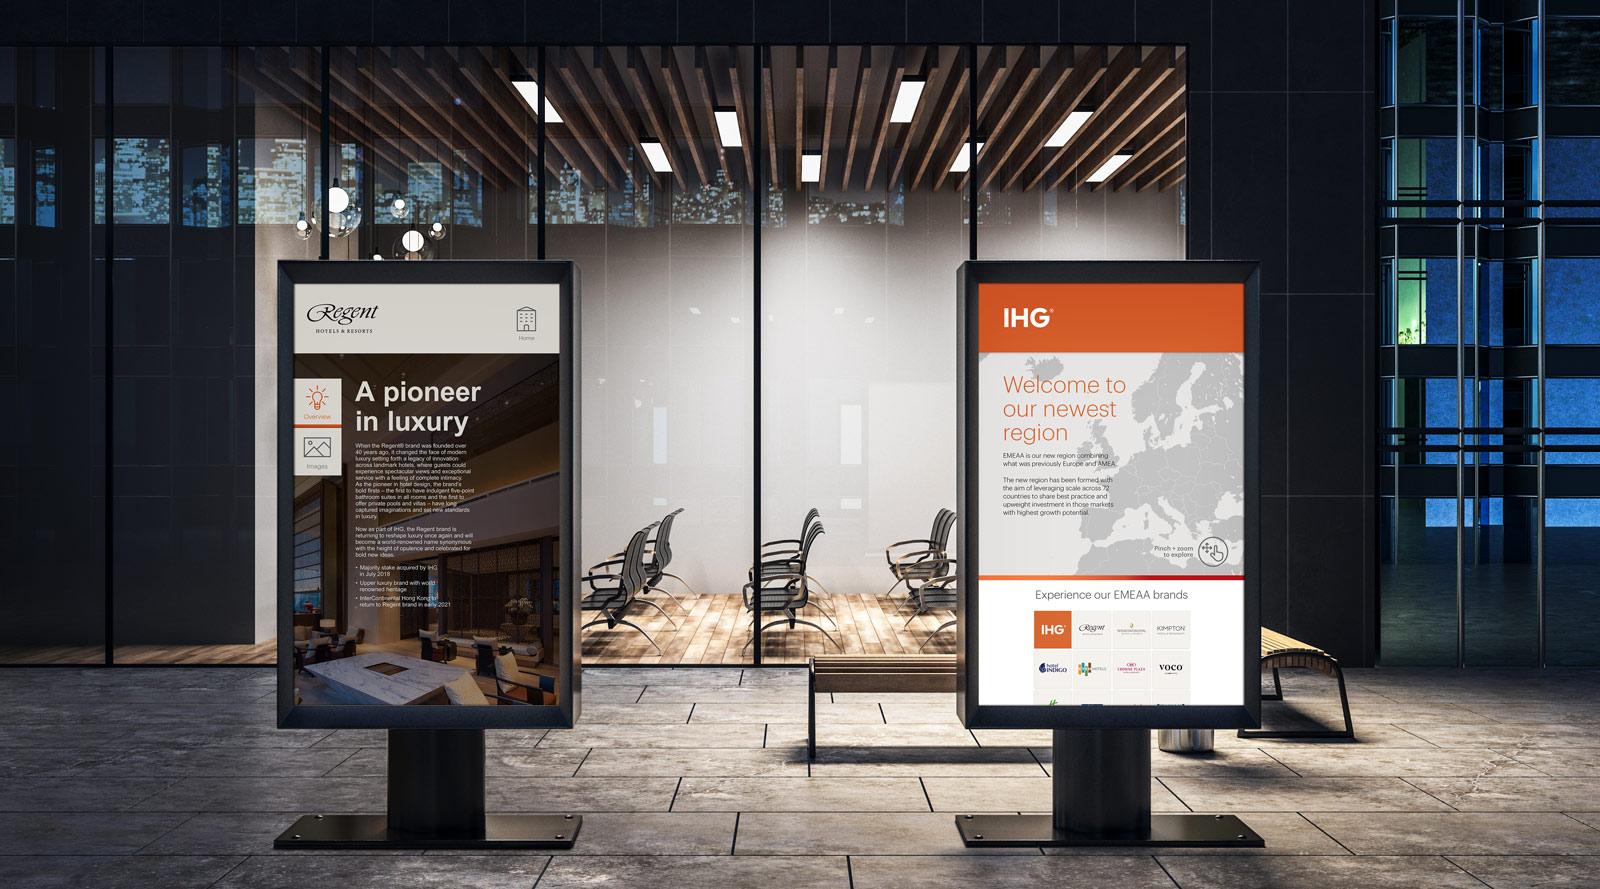 two large monitors displaying digital presentations outside office building IHG Regent